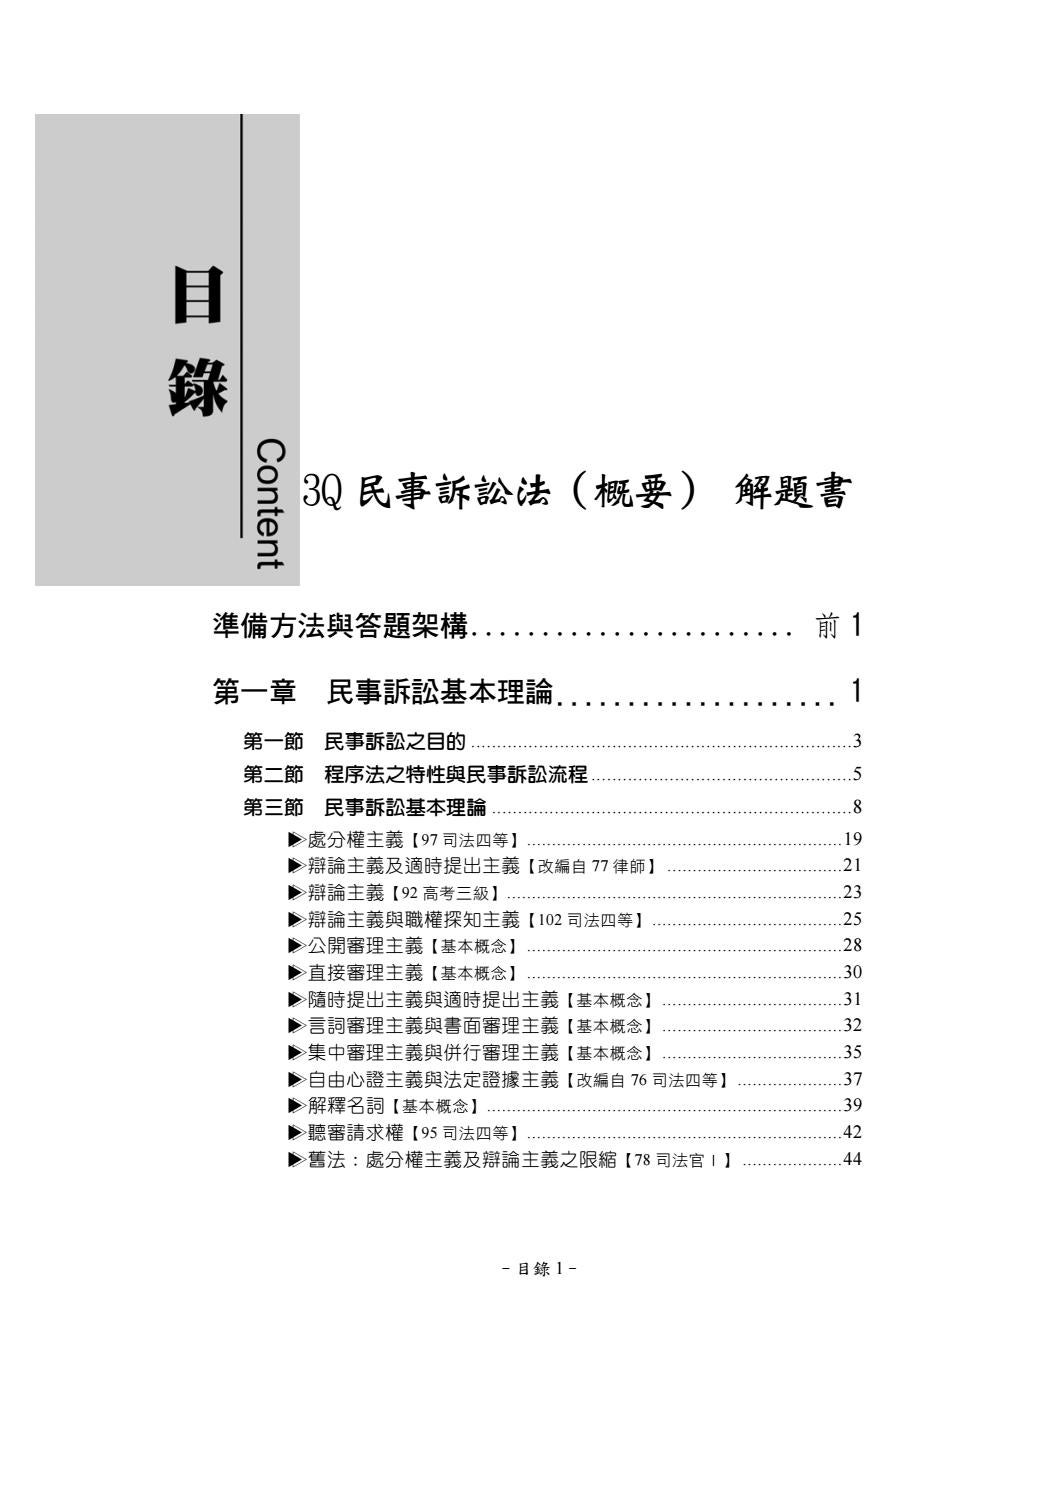 1C326 by 新保成出版社 - Issuu